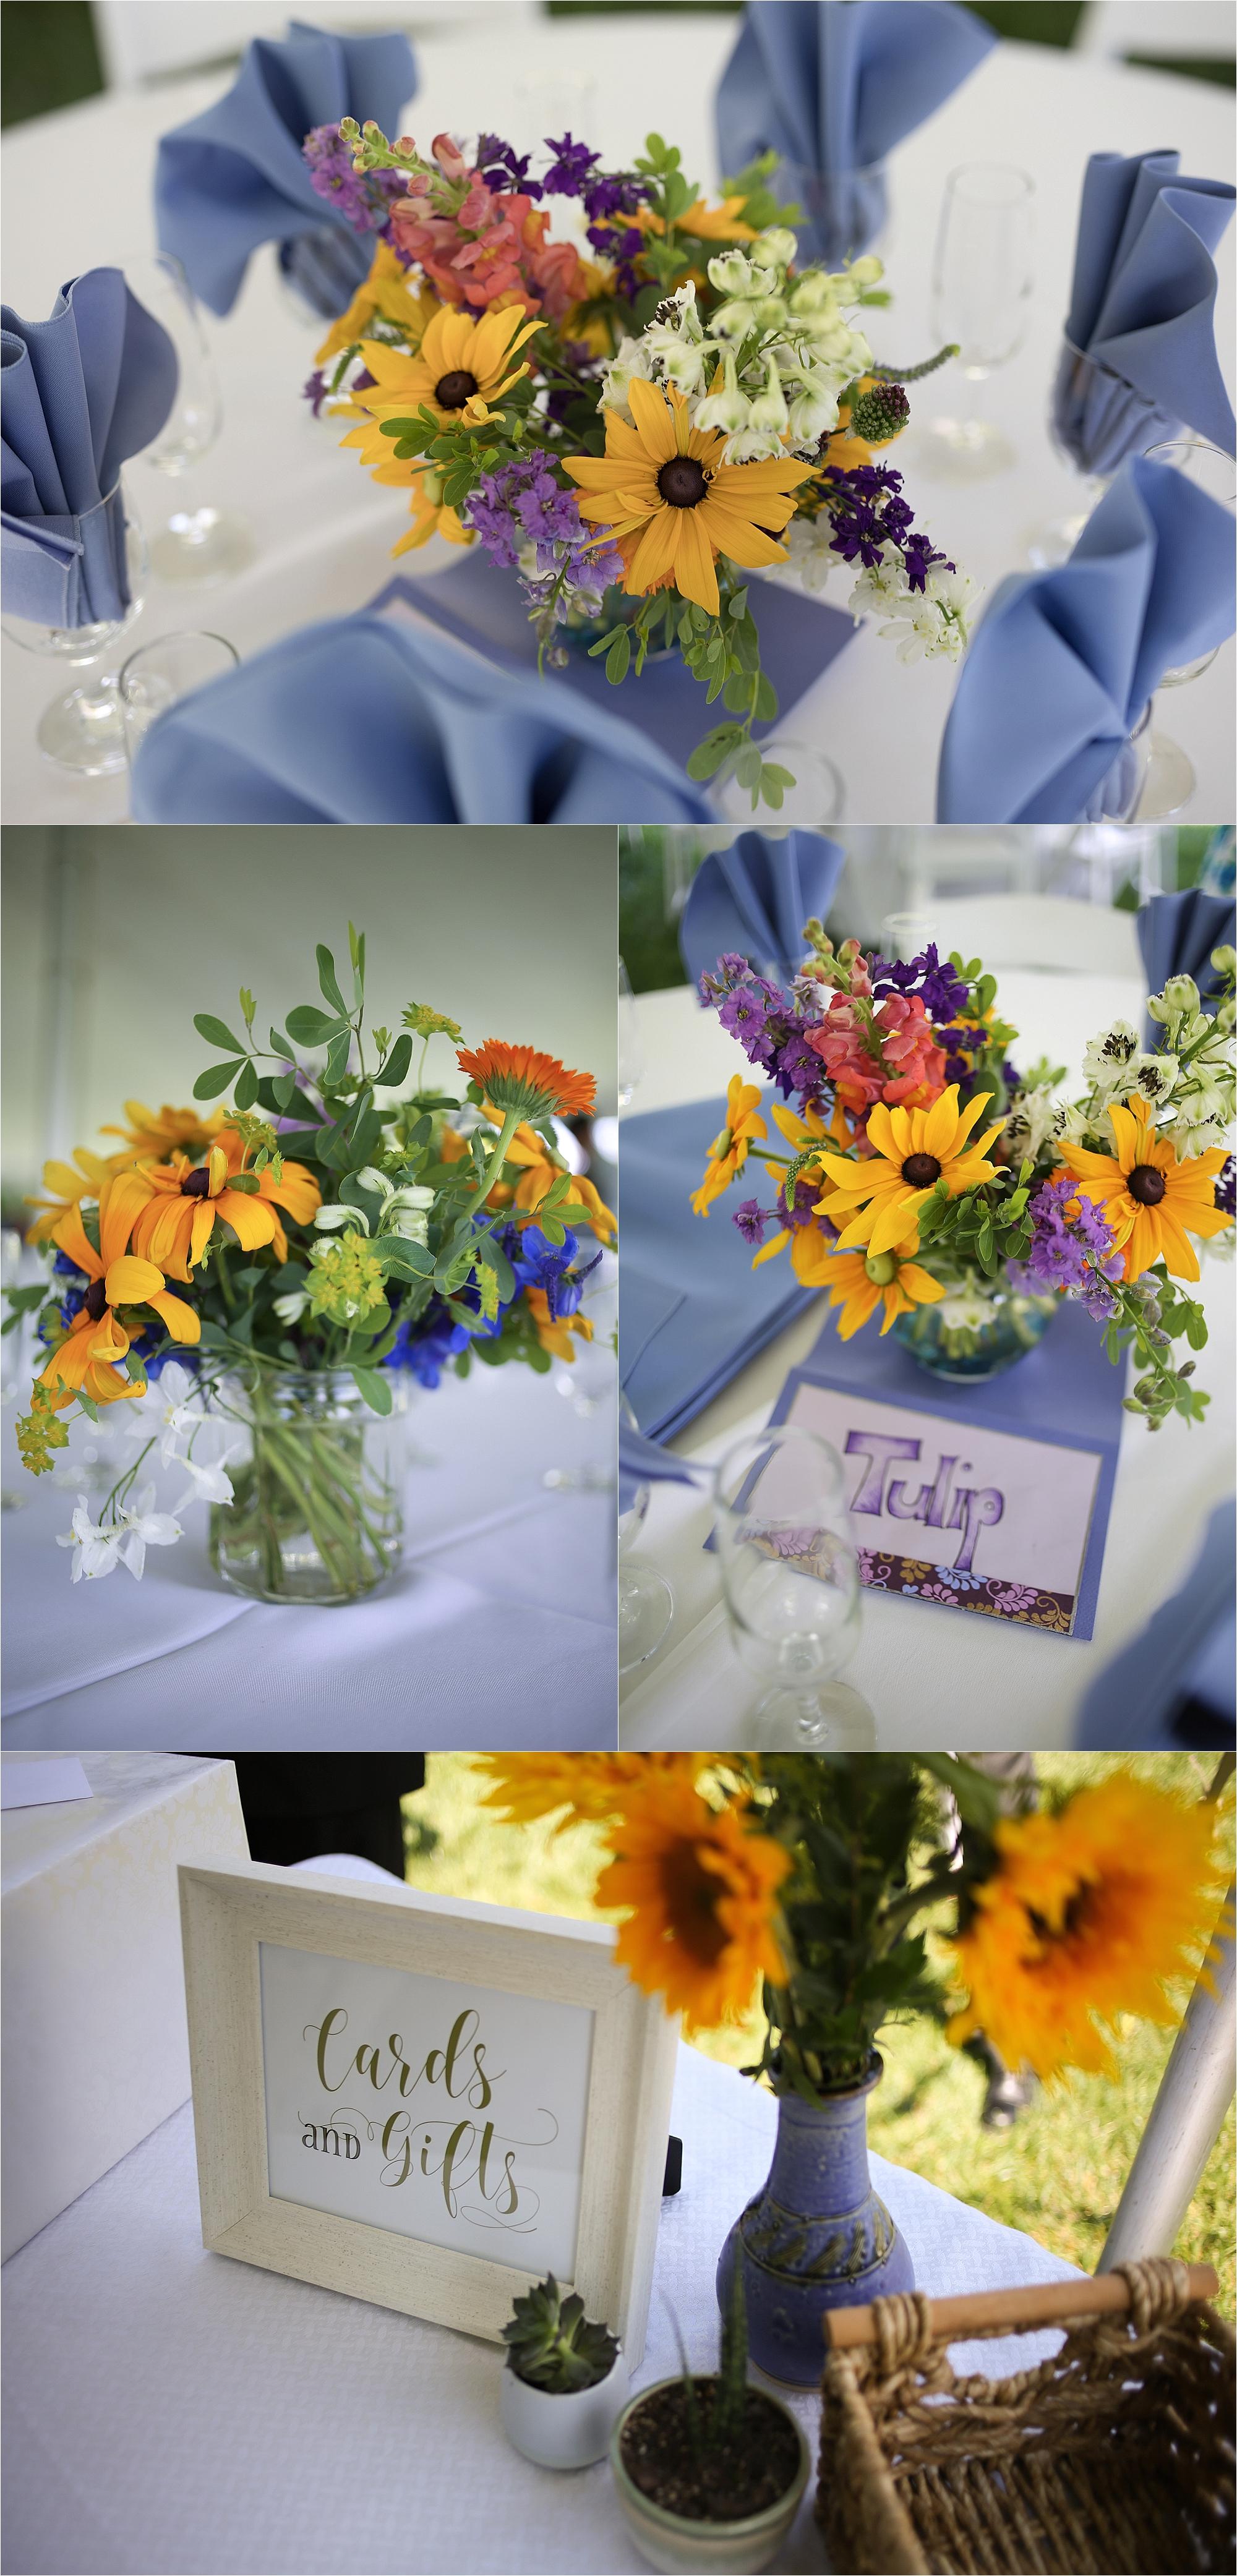 Hahn-Horticulture-Garden-Wedding-Photography_0001.jpg